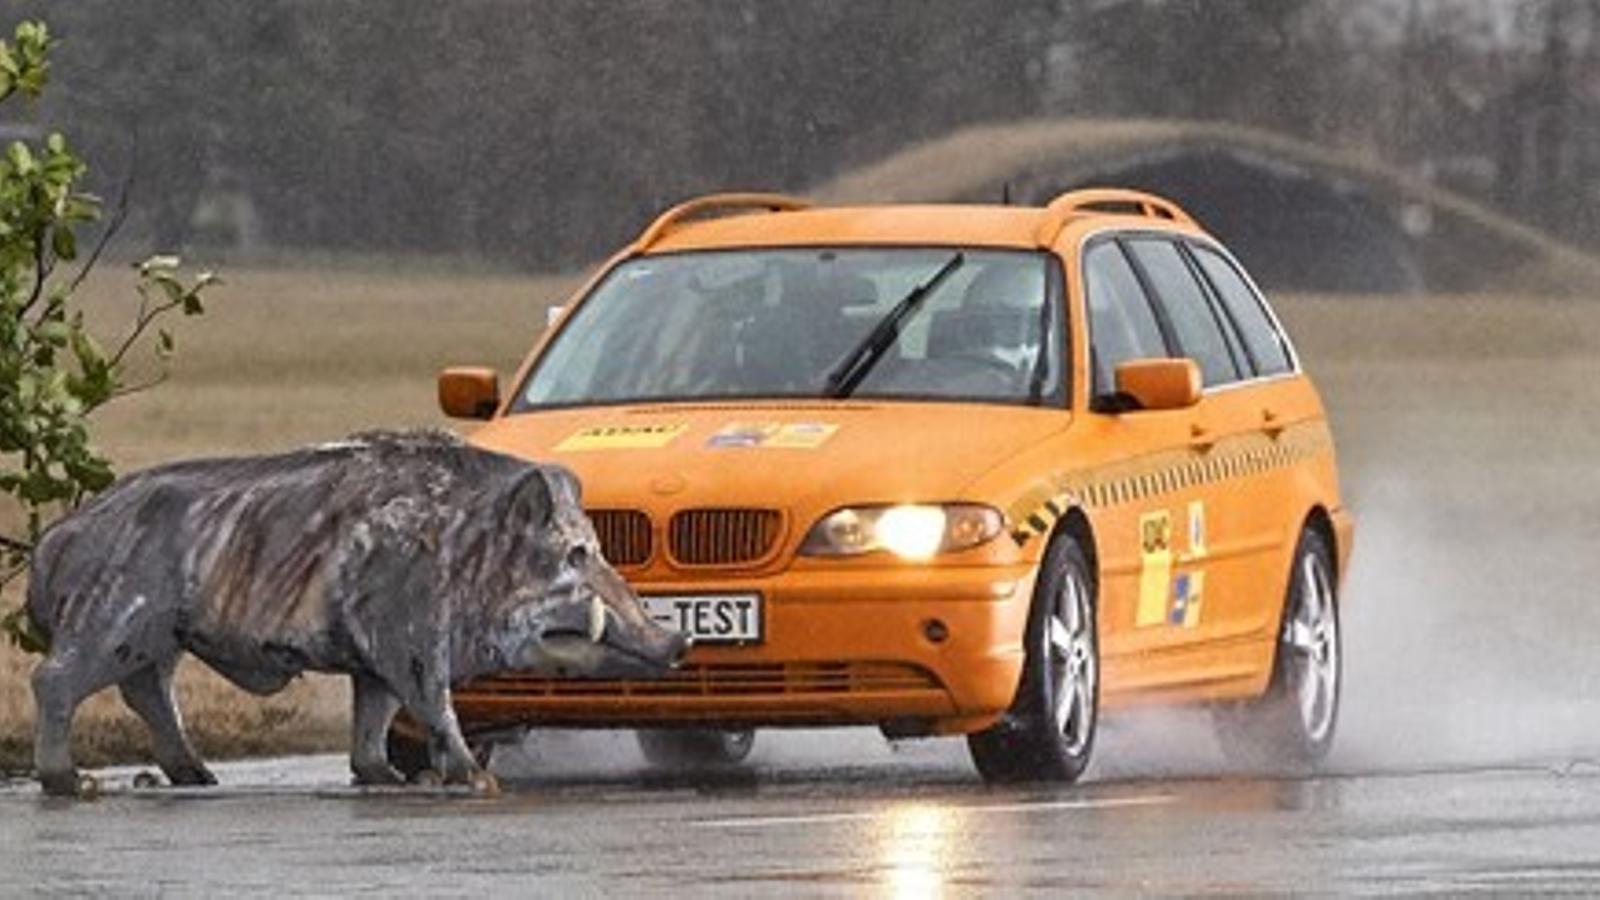 Així queda un cotxe en atropellar un senglar a 80 km/h